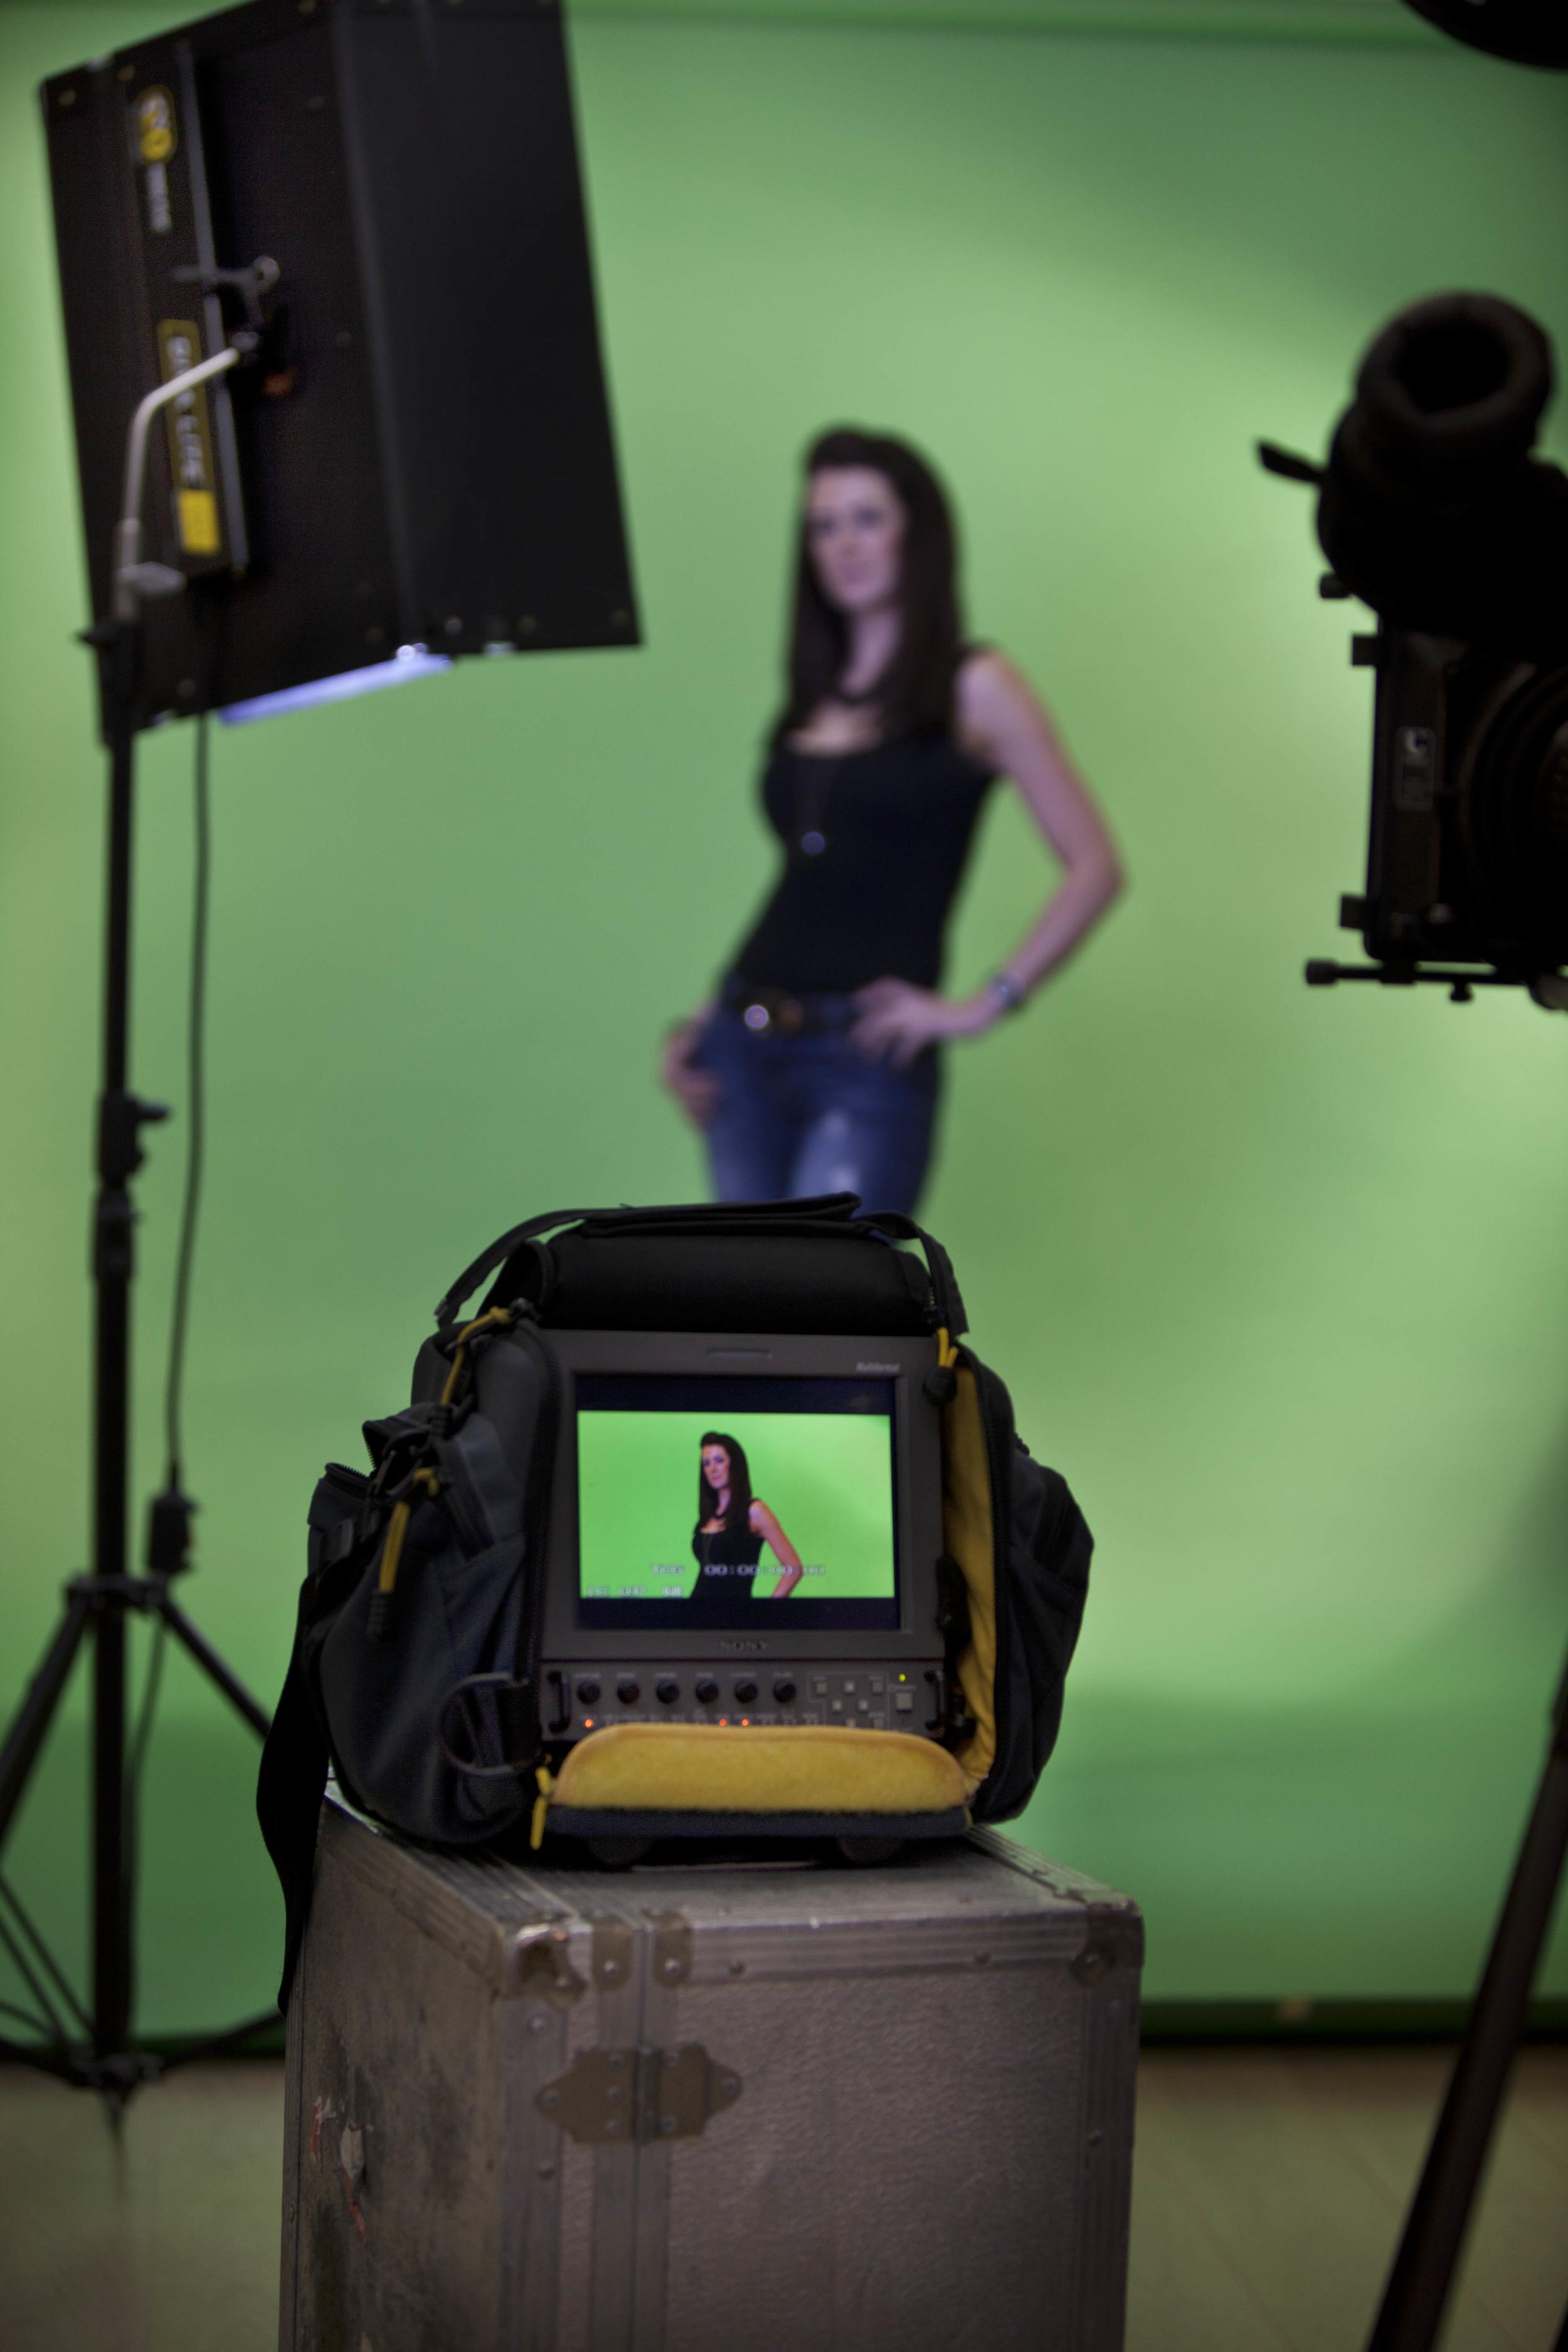 Sony F5 Digital Cinema Camera